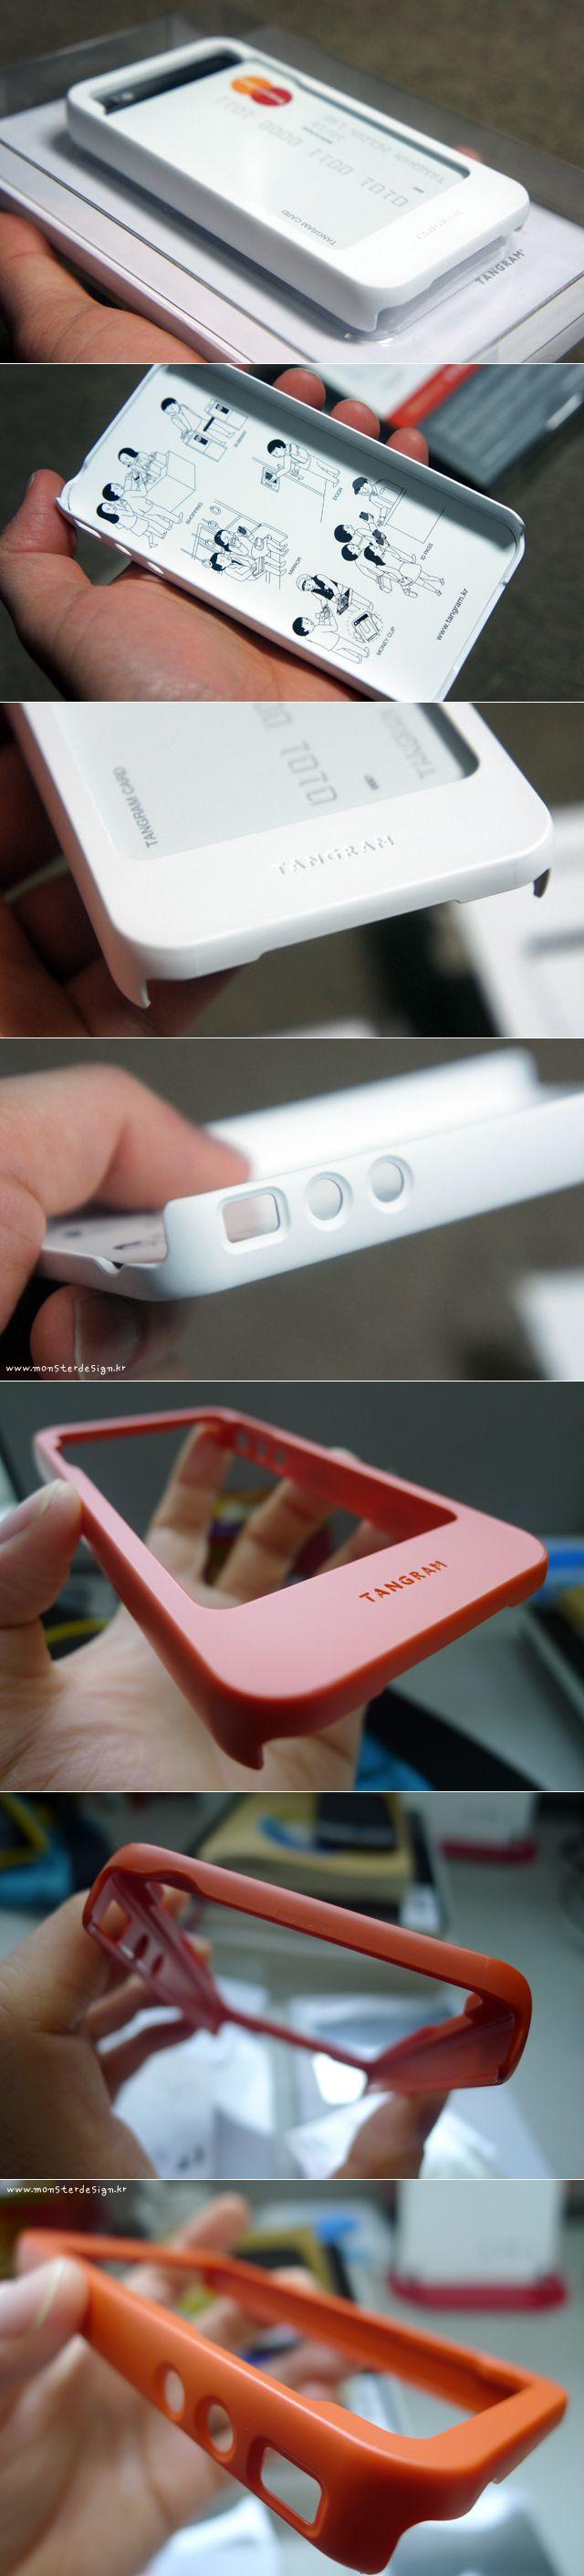 139 best Phone Case images on Pinterest | Phone cases, I phone ...